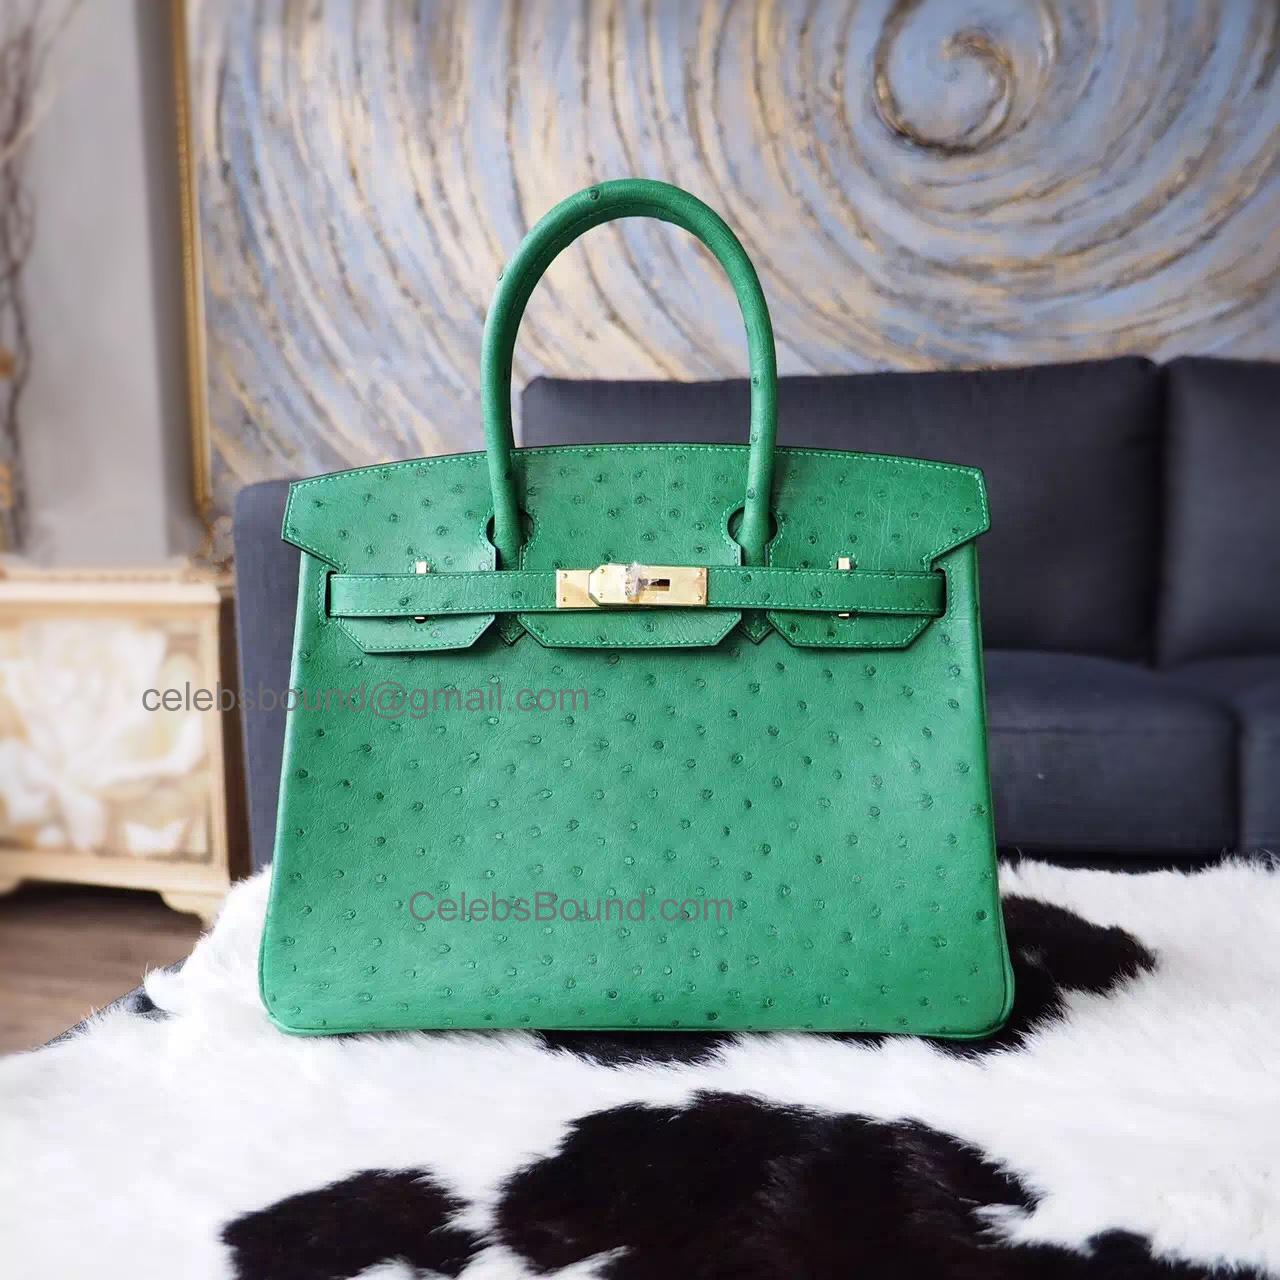 246db8e65040 Hand Stitched Hermes Birkin 30 Bag in 6g Pelouse Ostrich GHW